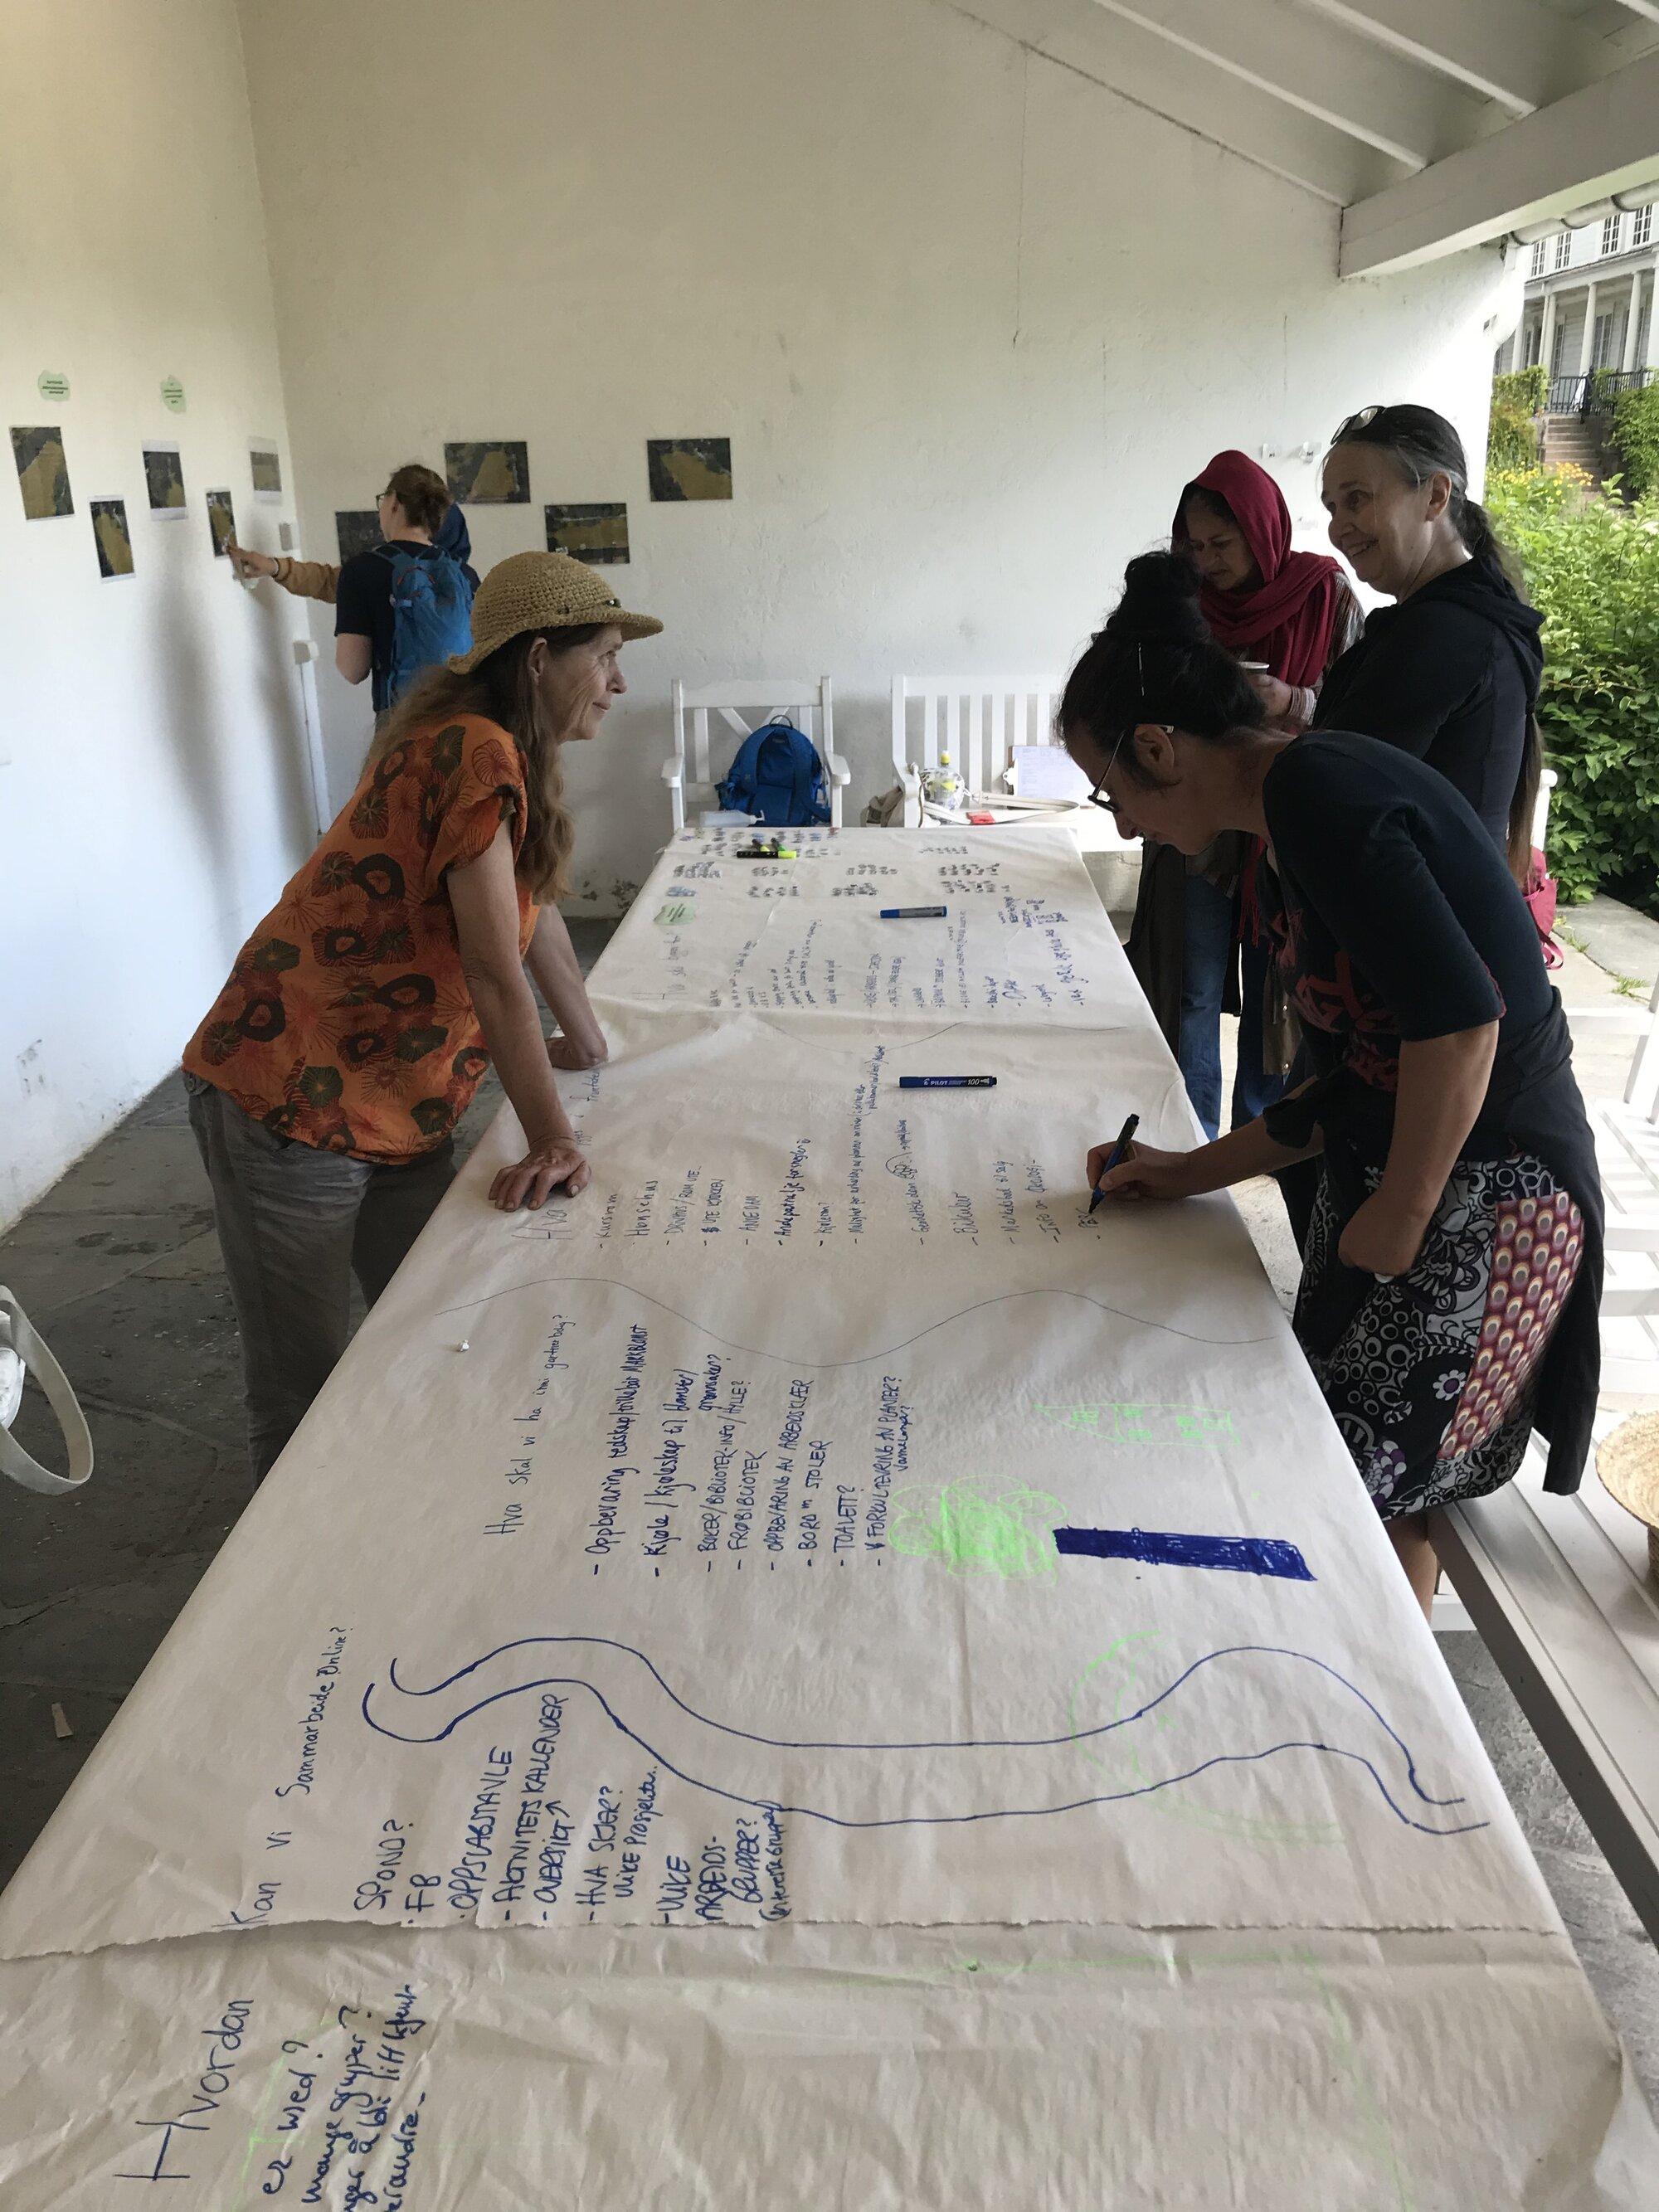 Image 3. Community engagement event at Linderud farm. Source: Kimberly Weger.